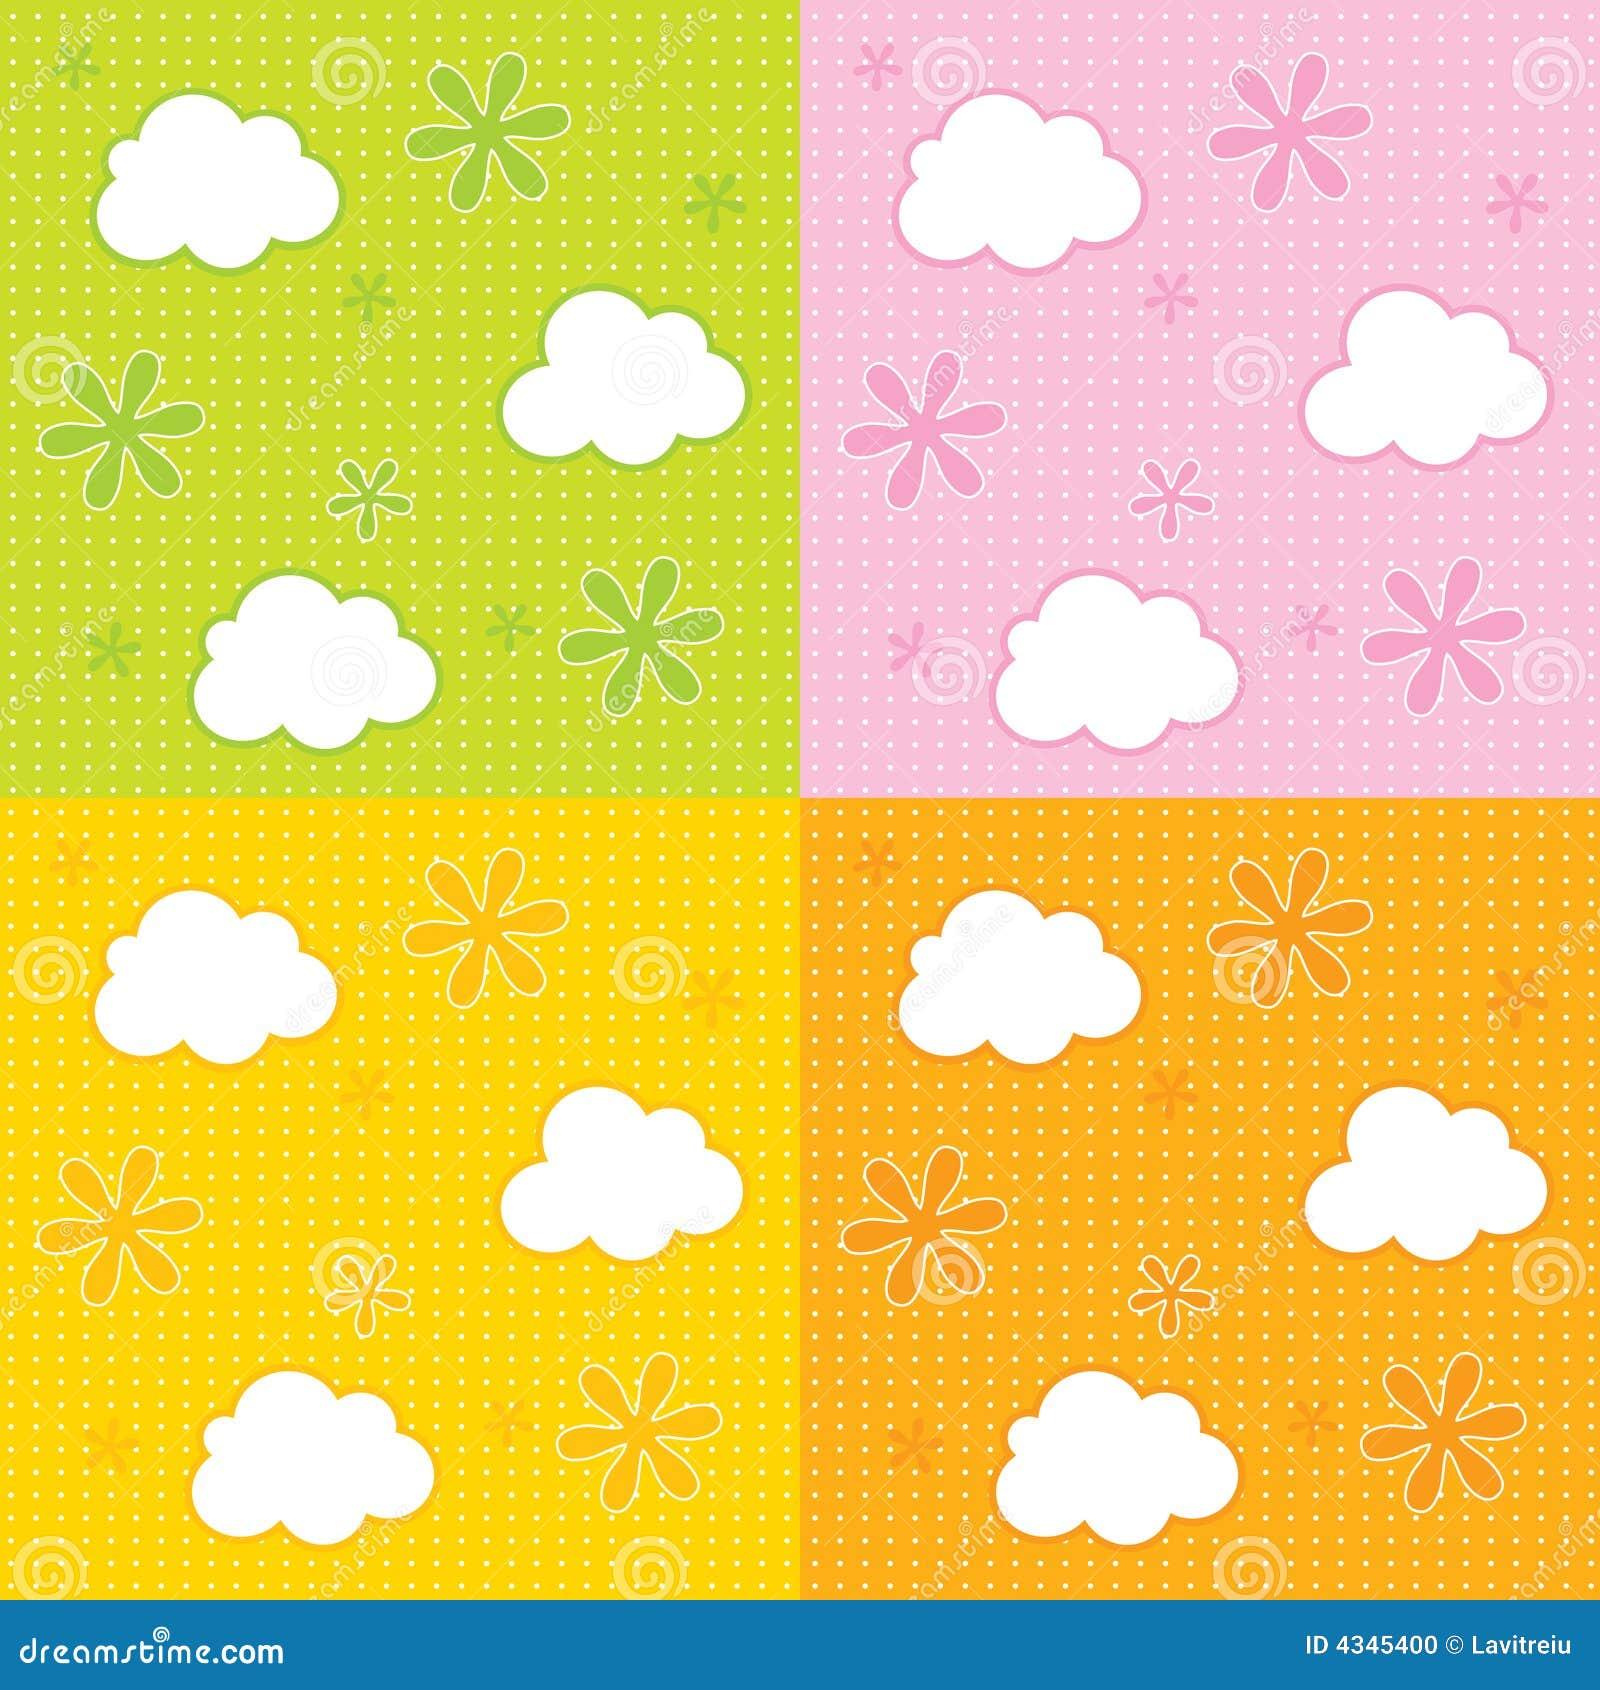 baby wallpaper background stock vector. illustration of children